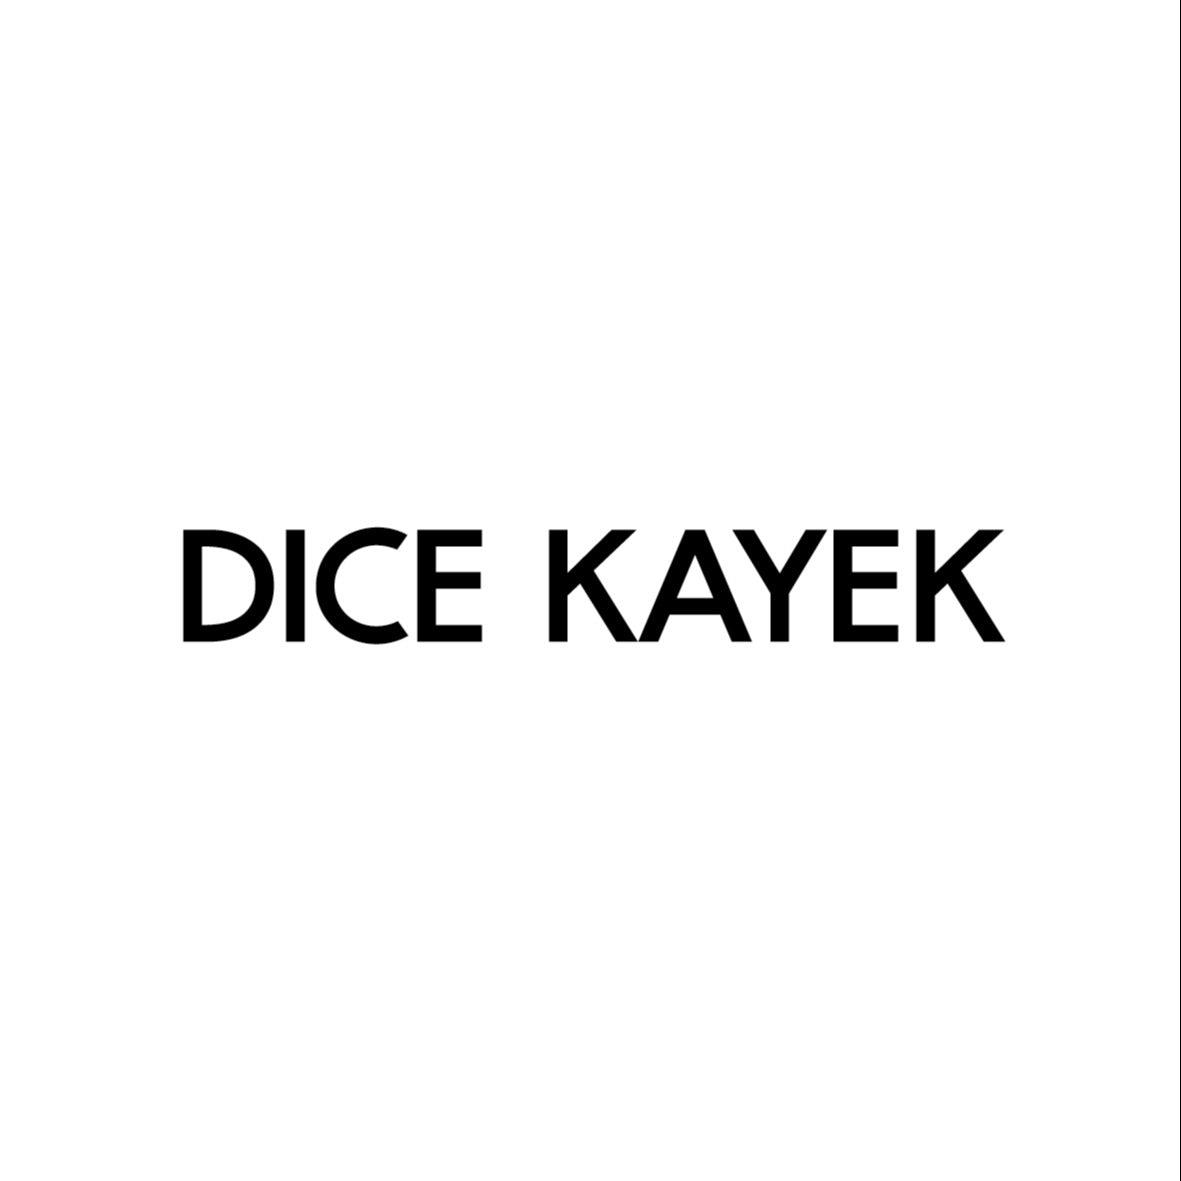 Dice Kayek company logo